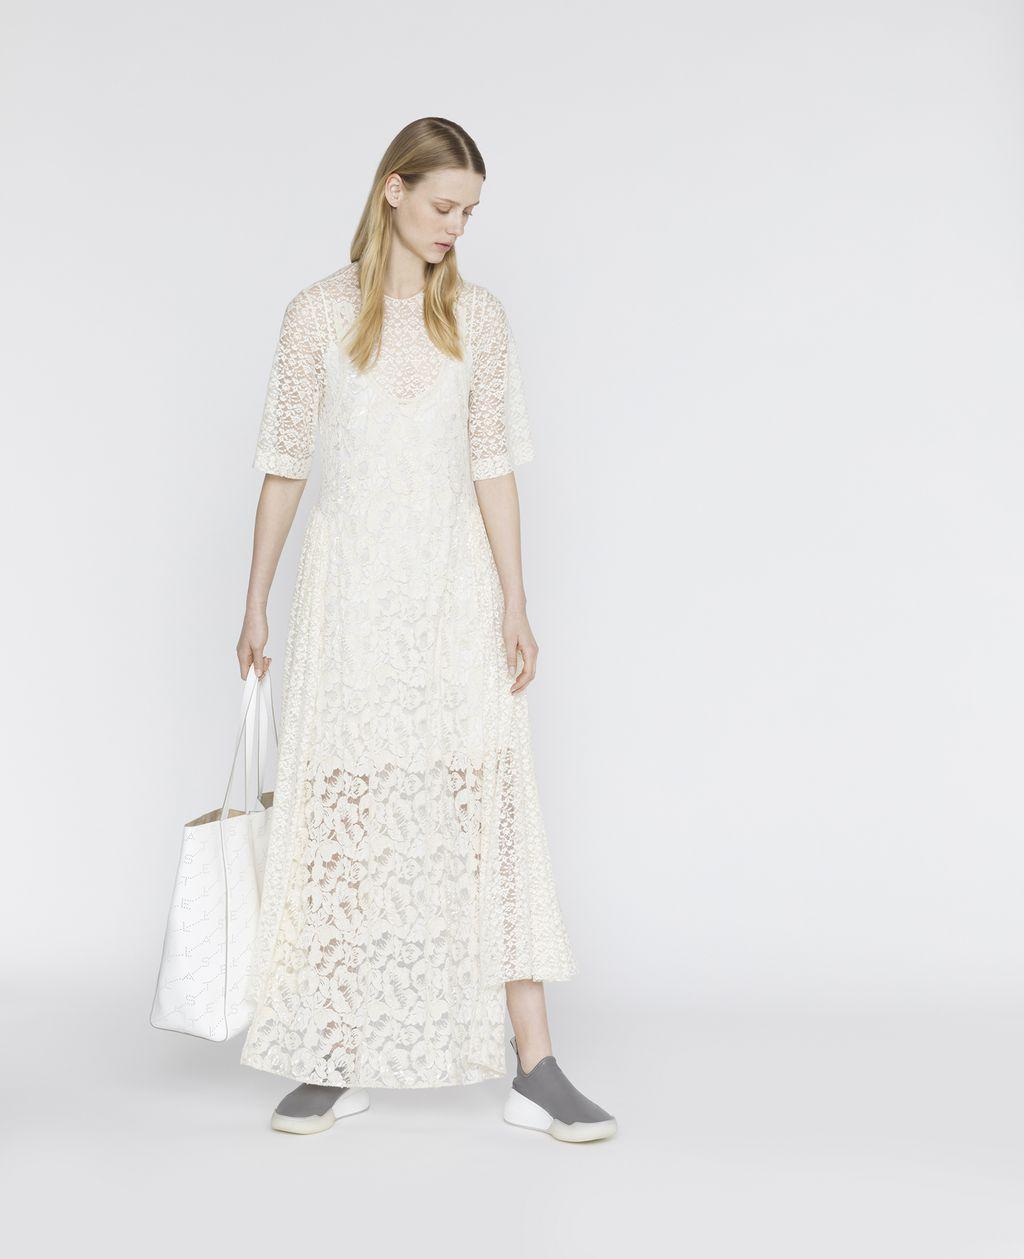 Tianna Dress Stella Mccartney Dresses Fashion Women Maxi [ 1259 x 1024 Pixel ]